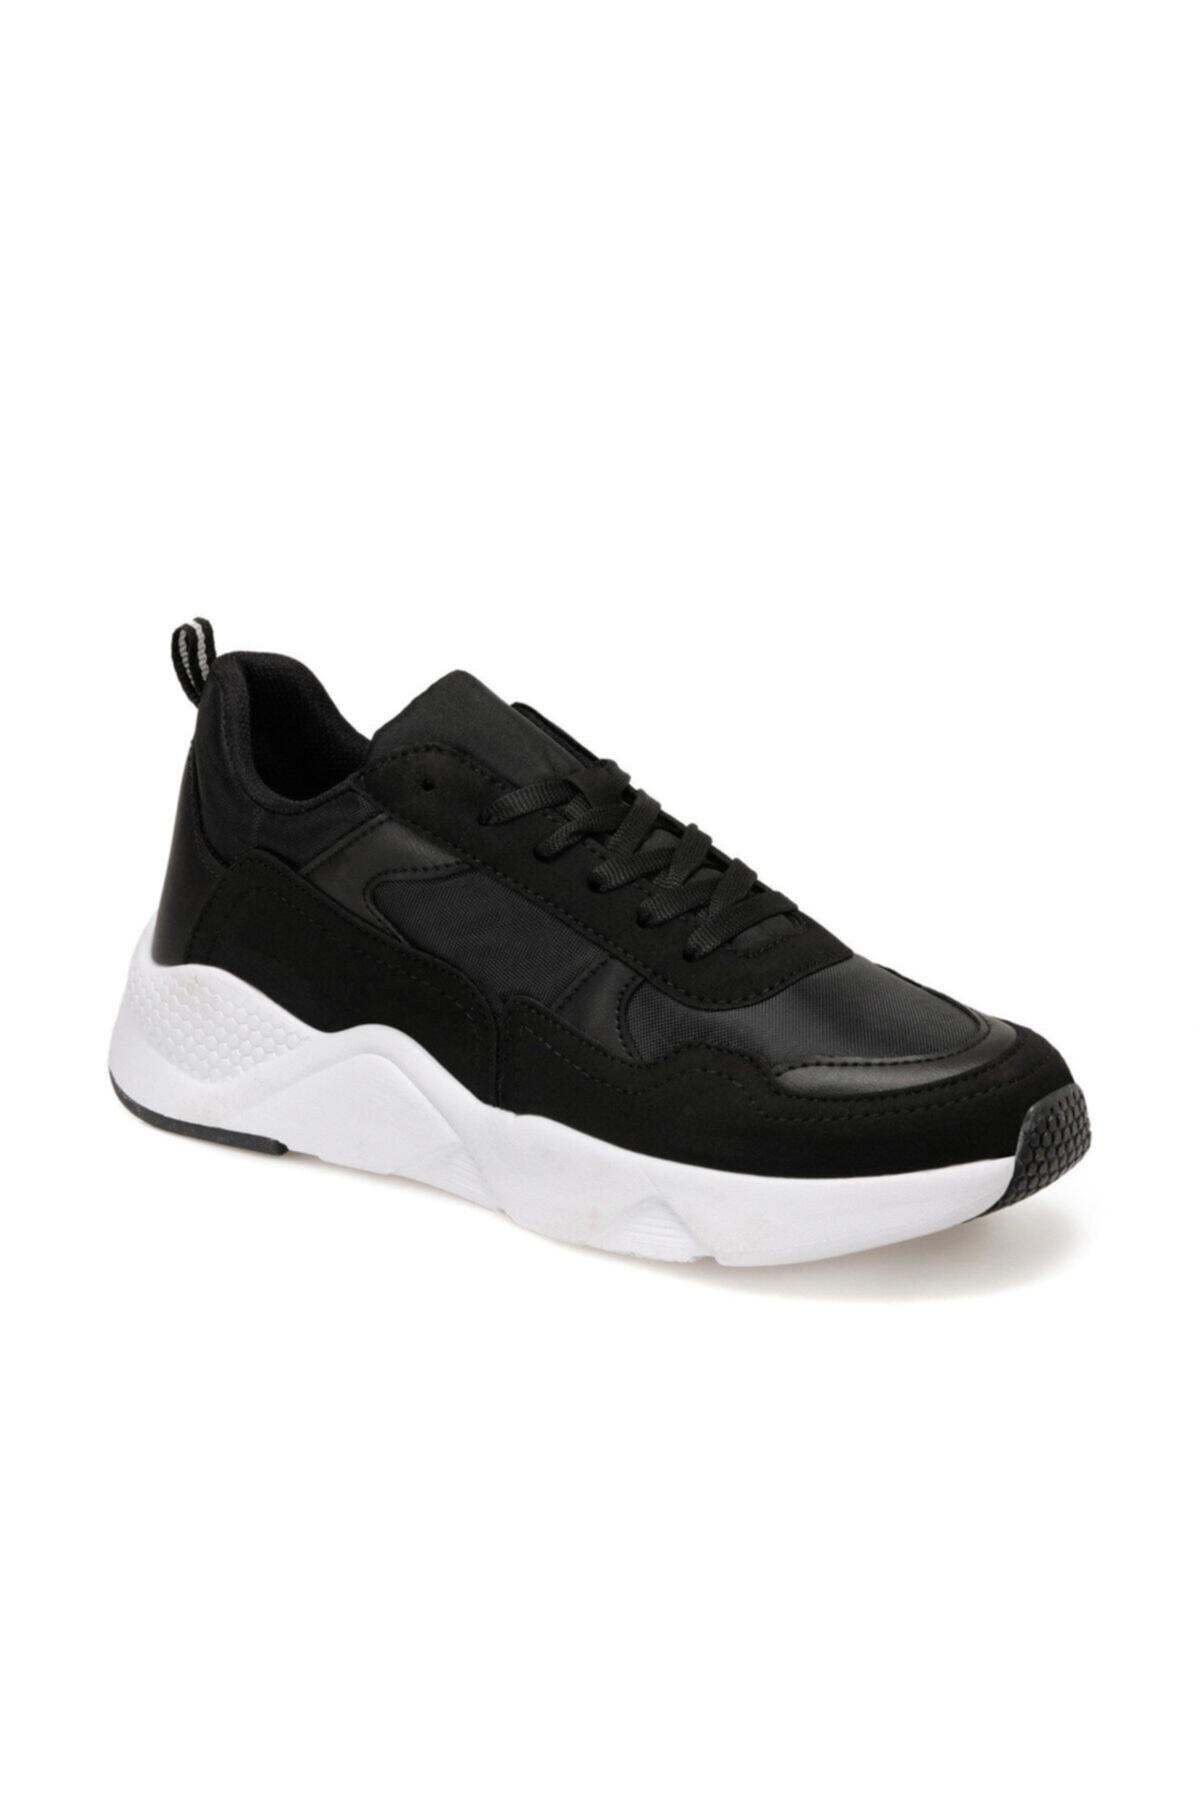 Torex DENVER Siyah Erkek Sneaker Ayakkabı 100577239 1